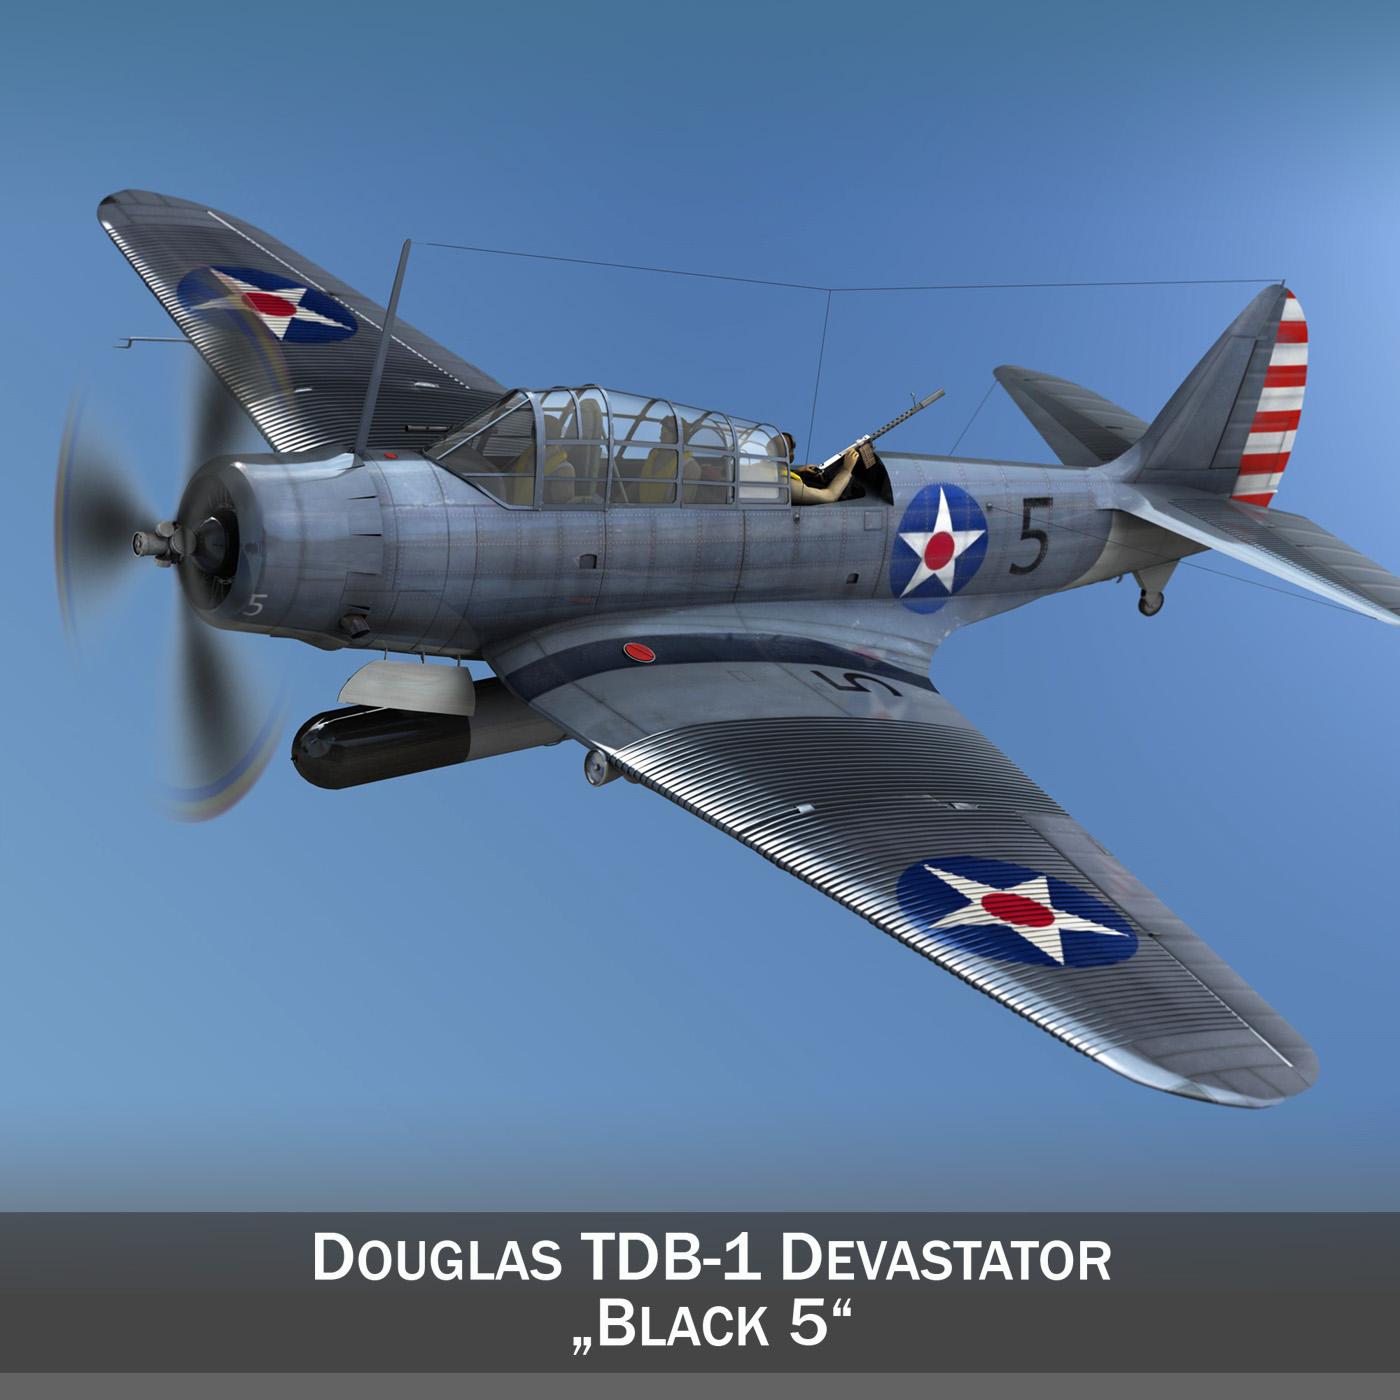 douglas db-1 devastator model 3d 3ds fbx c4d lwo obj 199937